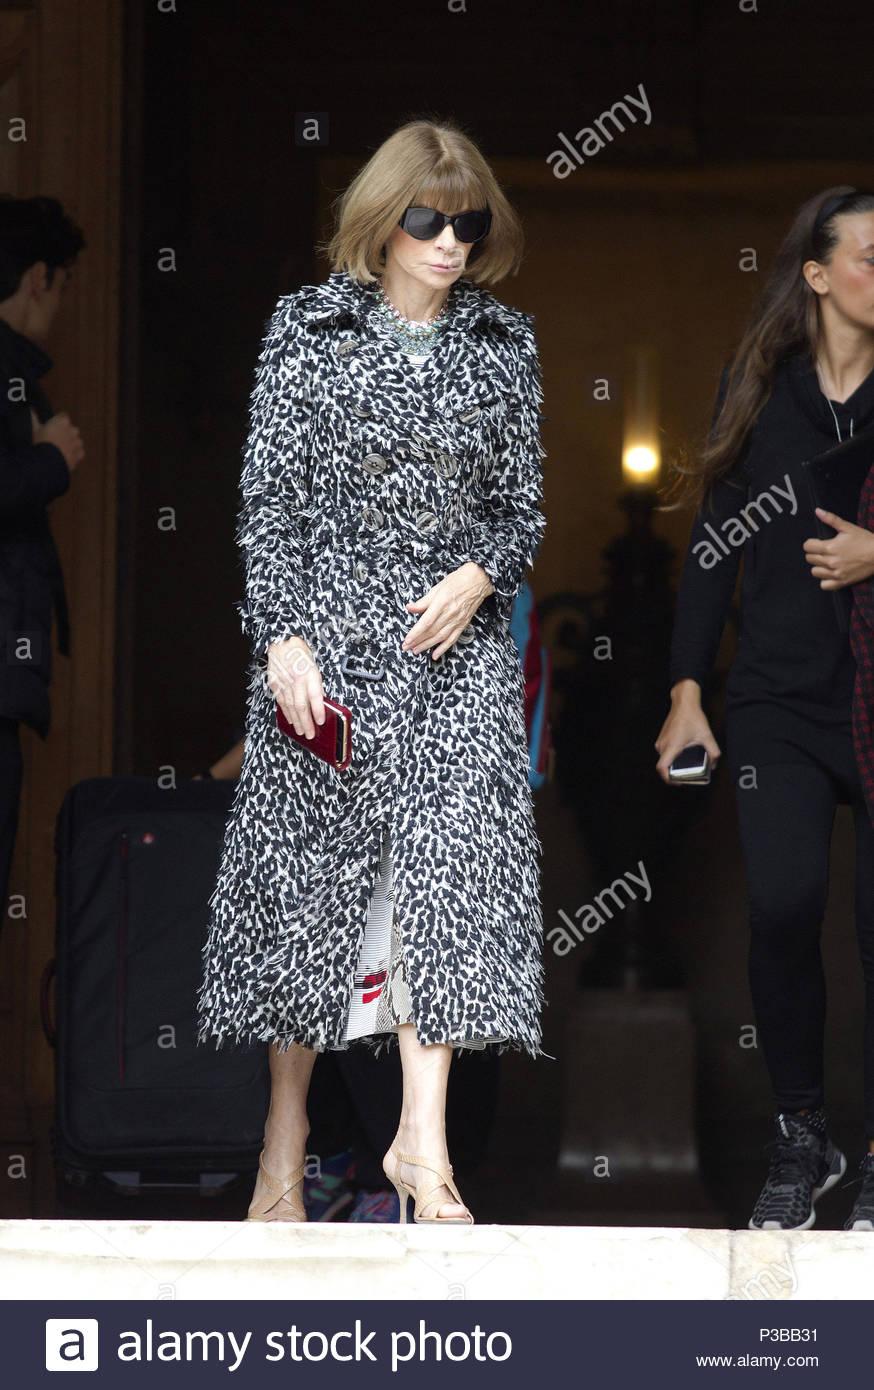 45296fefbb77 anna Wintour. Paris fashion week - ready to wear- Stella McCartney Paris  France october 5, 2015